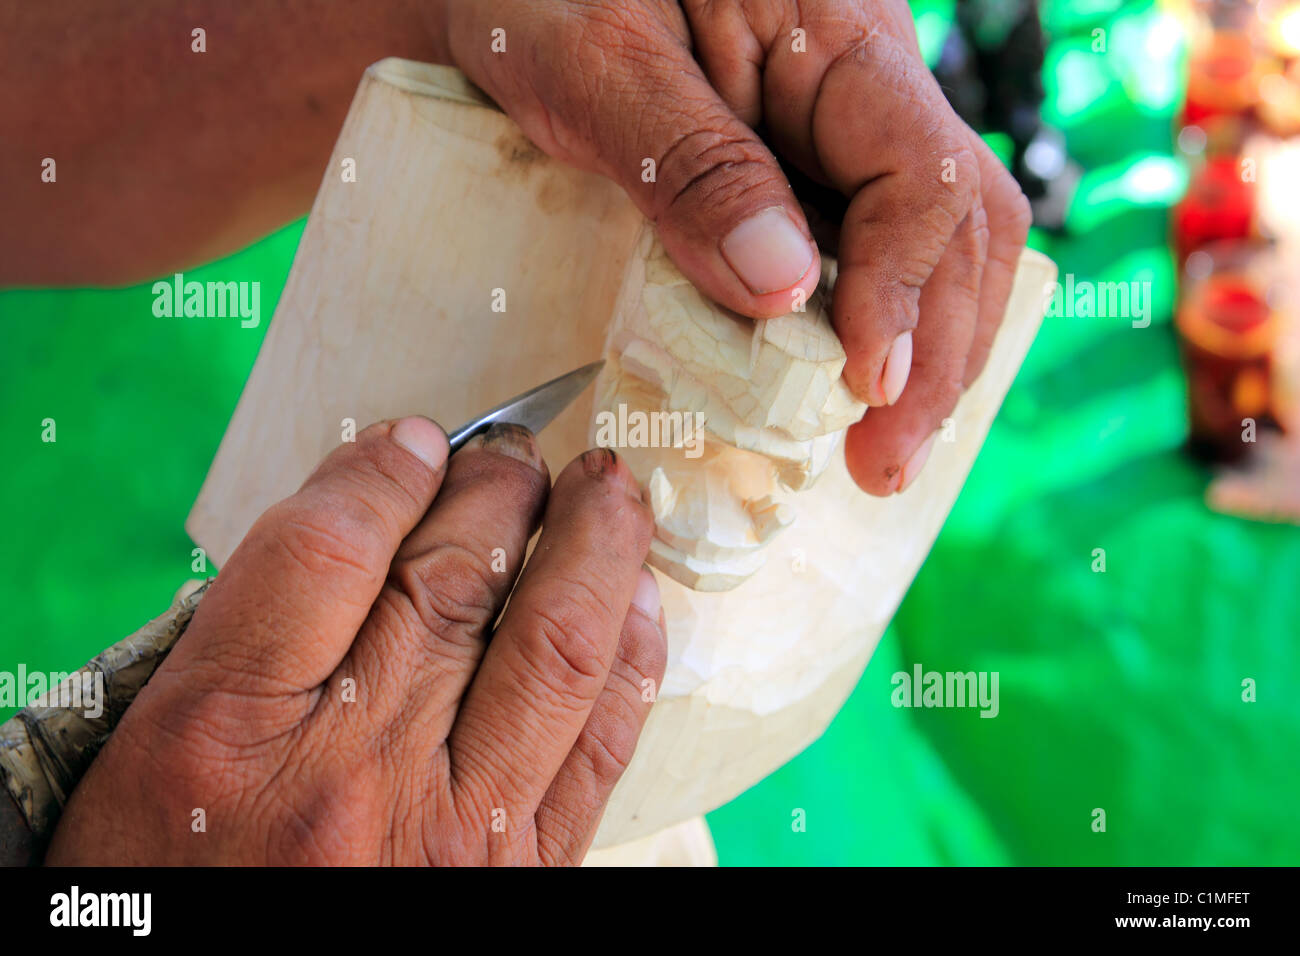 Jaguar mayan sculptor handcraft knife hands Chichen Itza Mexico - Stock Image